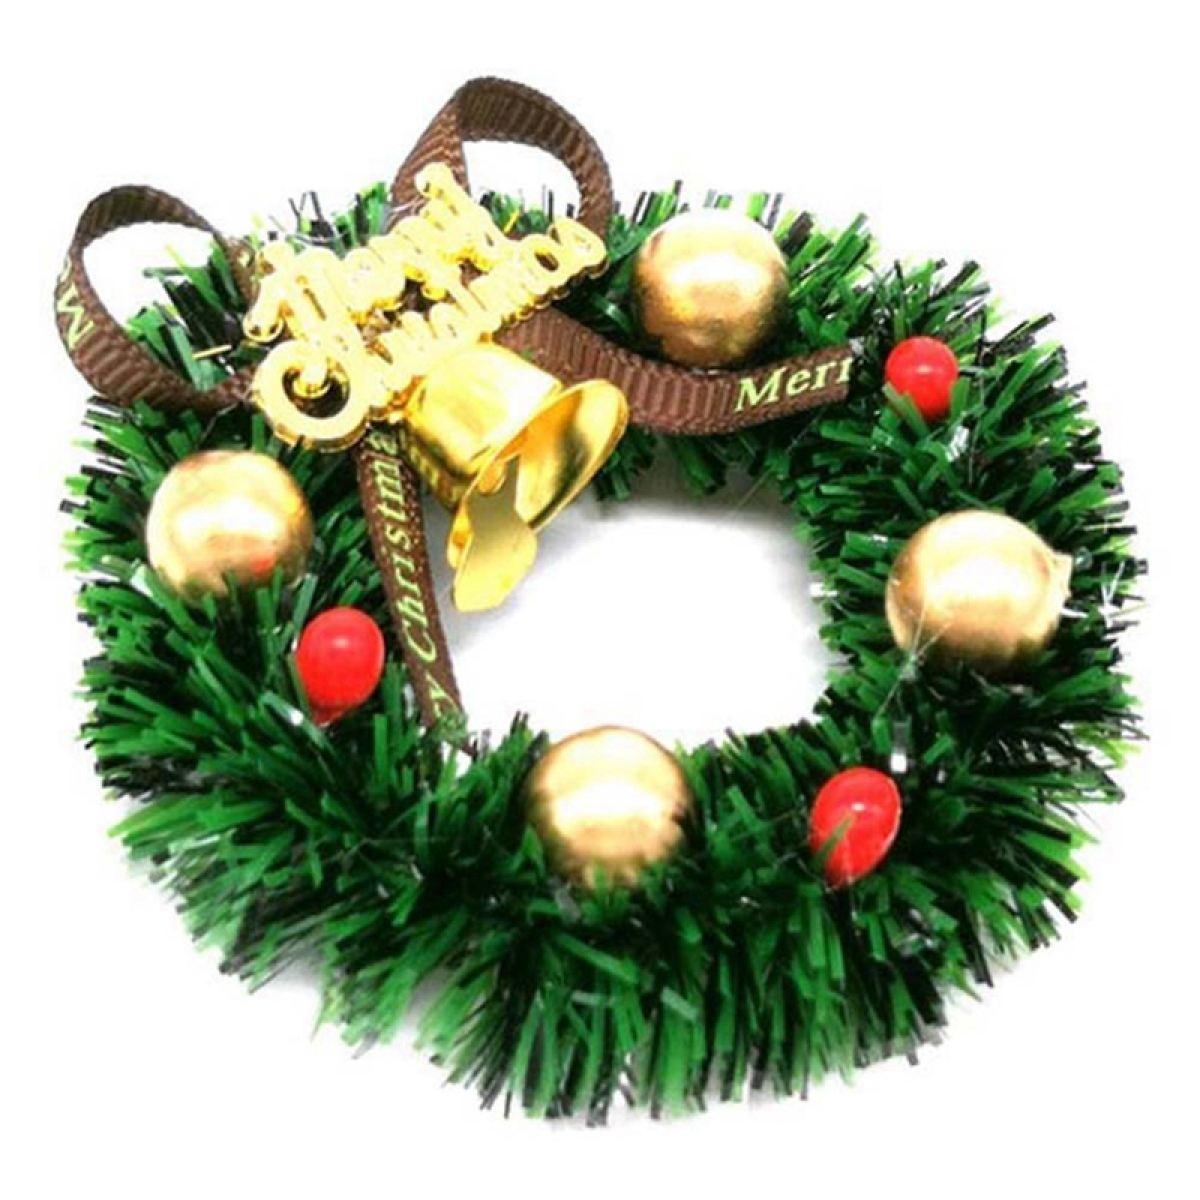 Dolls House Mini Hanging Xmas Wreath Dollhouse Christmas Tree Decoration Garland Kids Pretend Play Toy Lazada